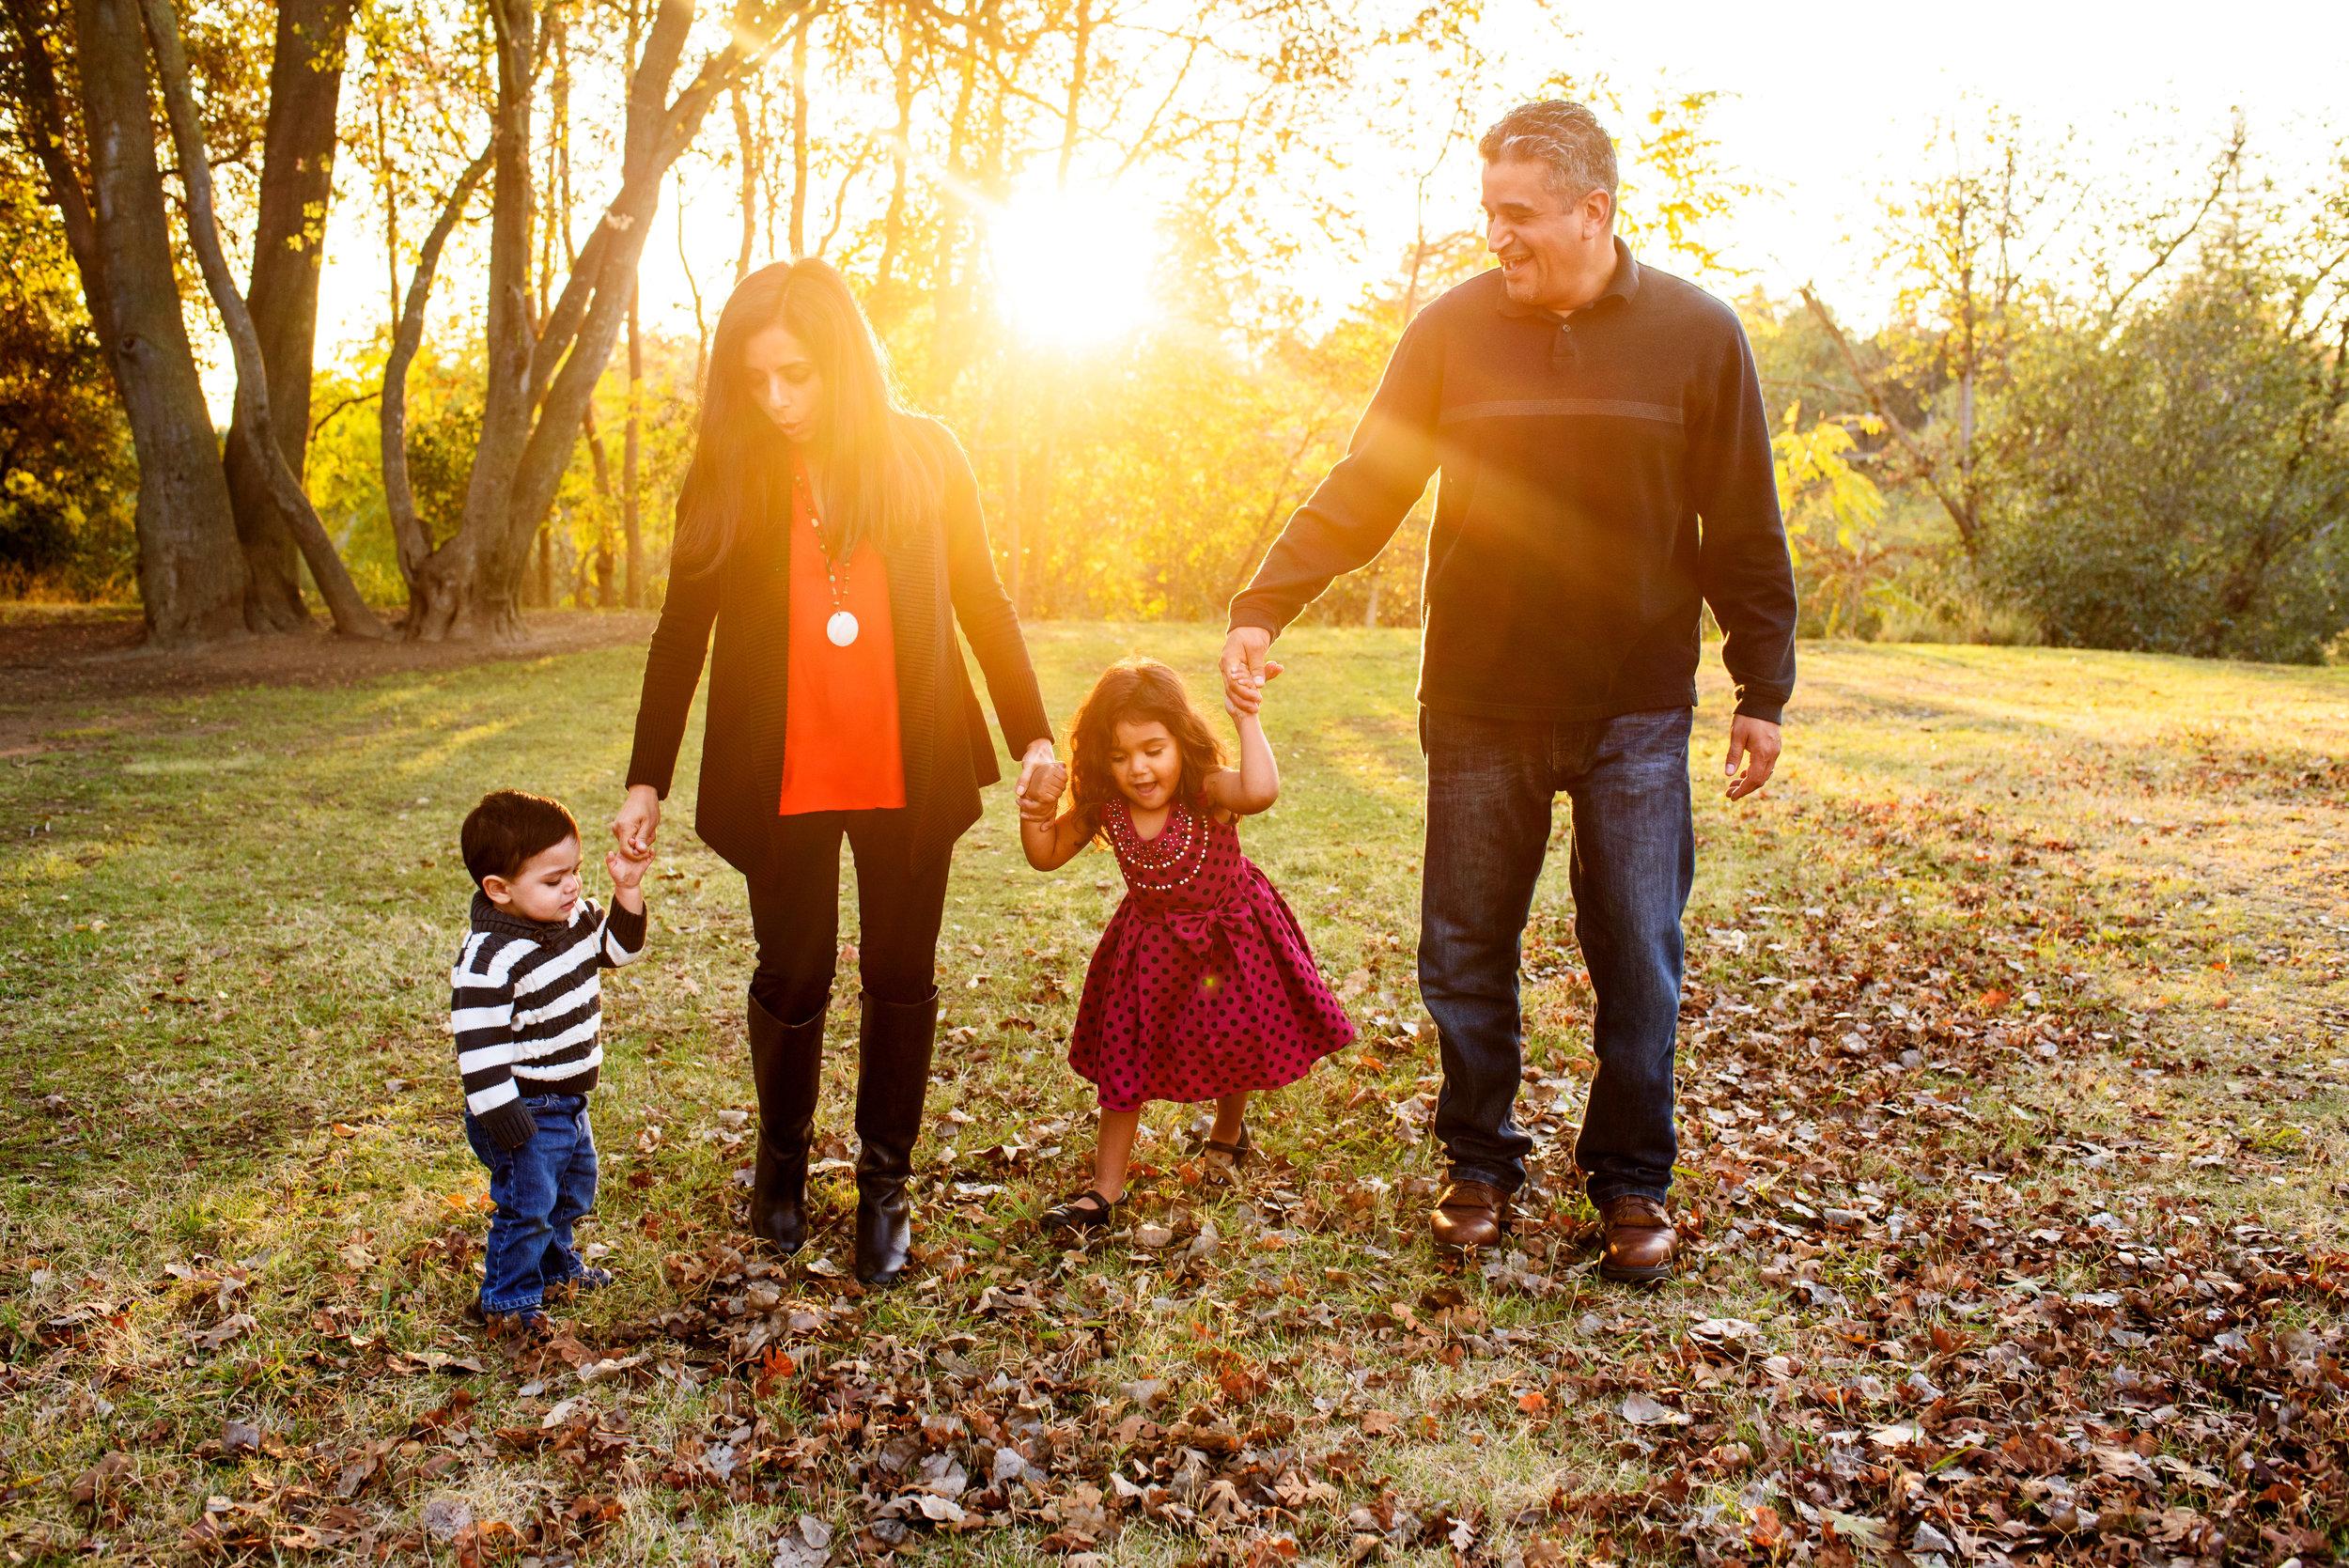 vargas-family-115-sacramento-family-photographer-katherine-nicole-photography.JPG